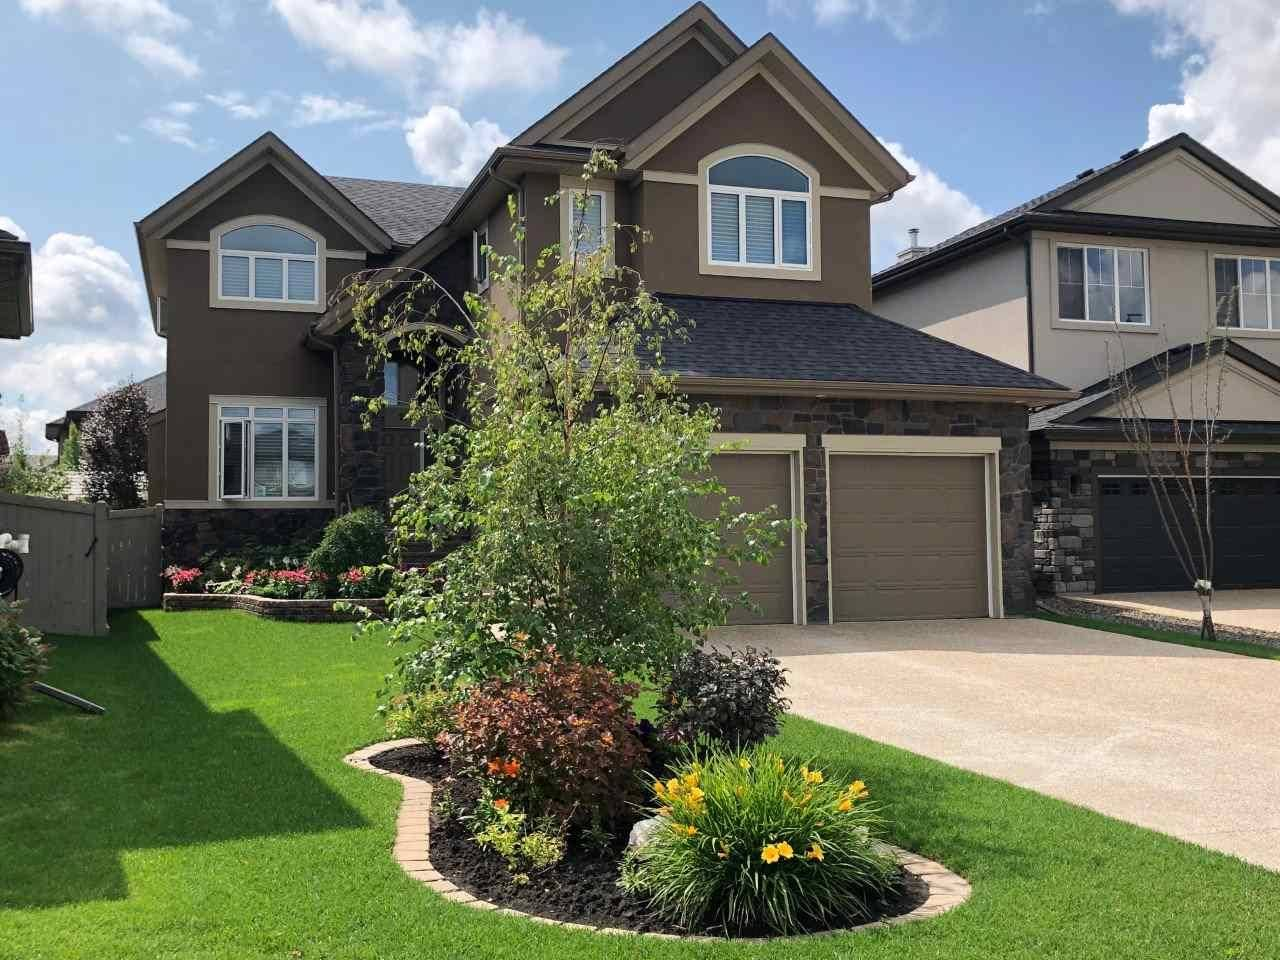 House for sale at 2813 Watcher Ct Sw Edmonton Alberta - MLS: E4190293